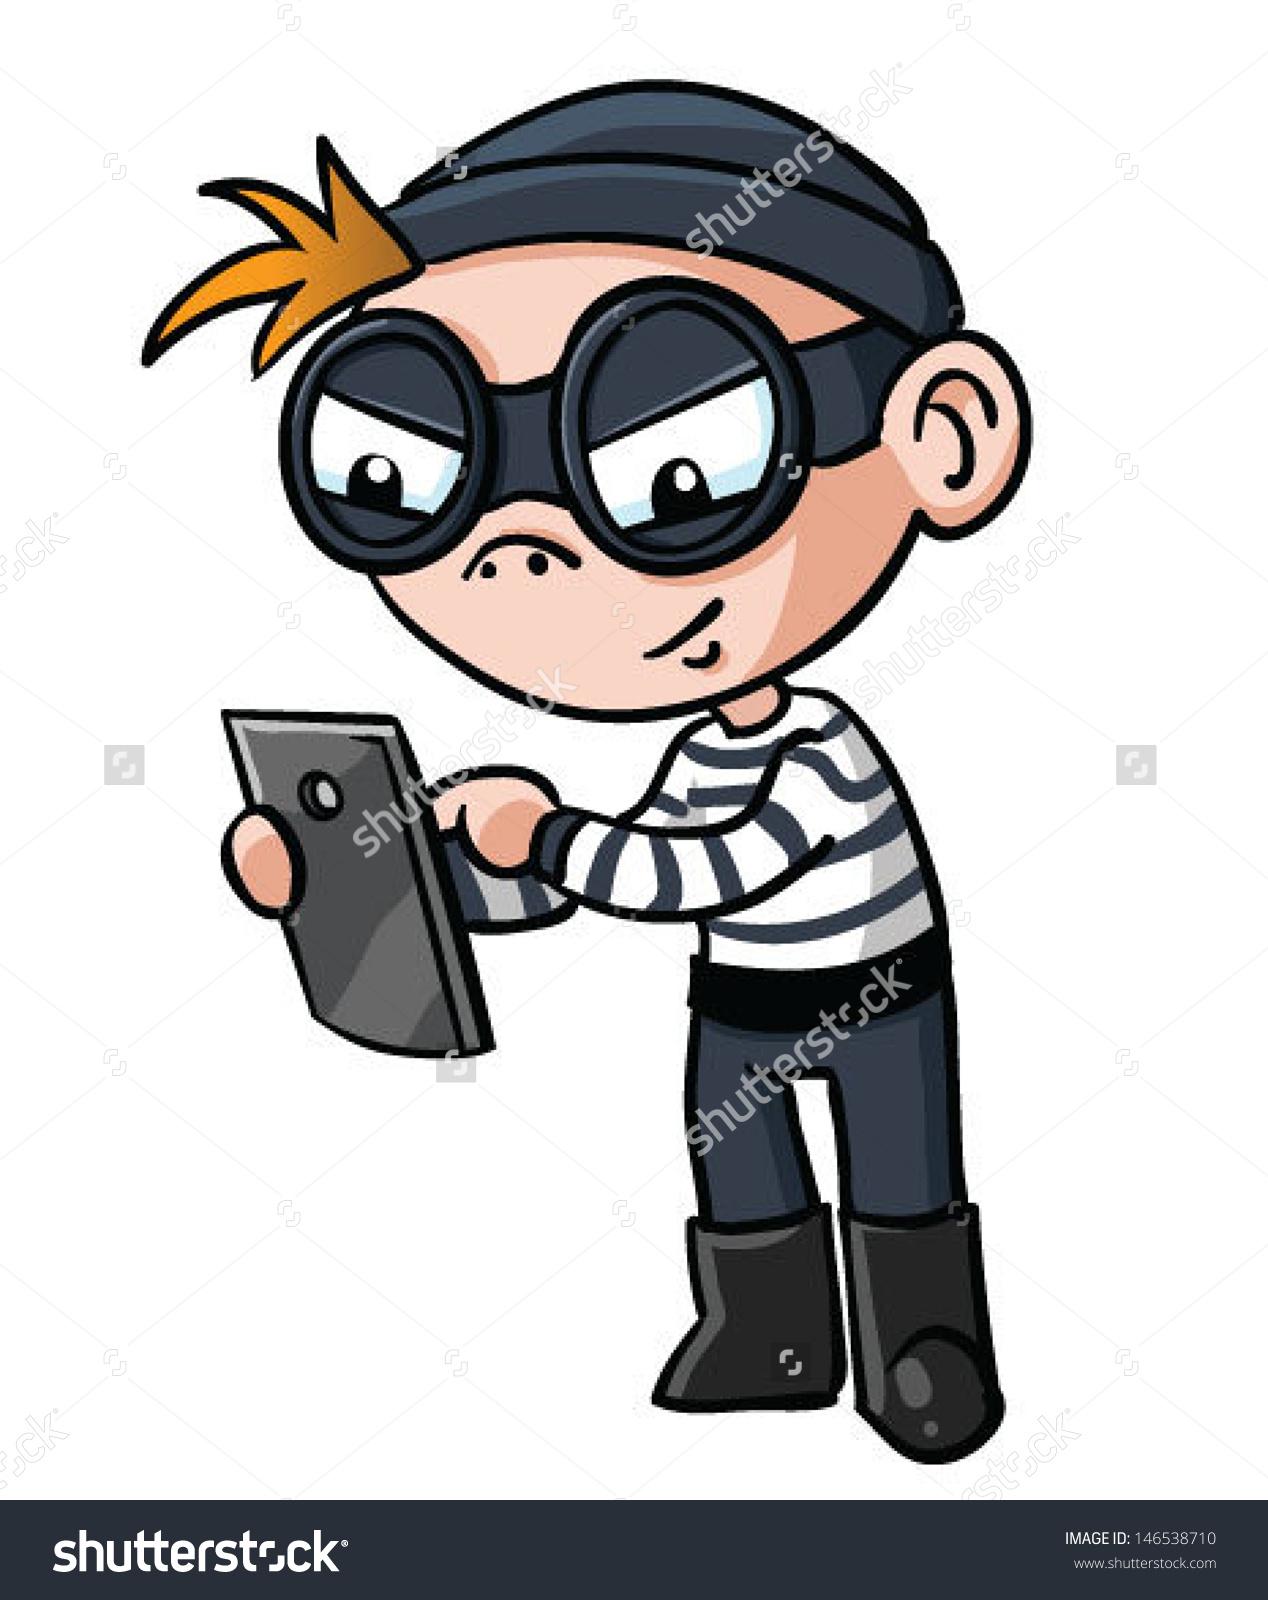 Cyber criminal clipart.